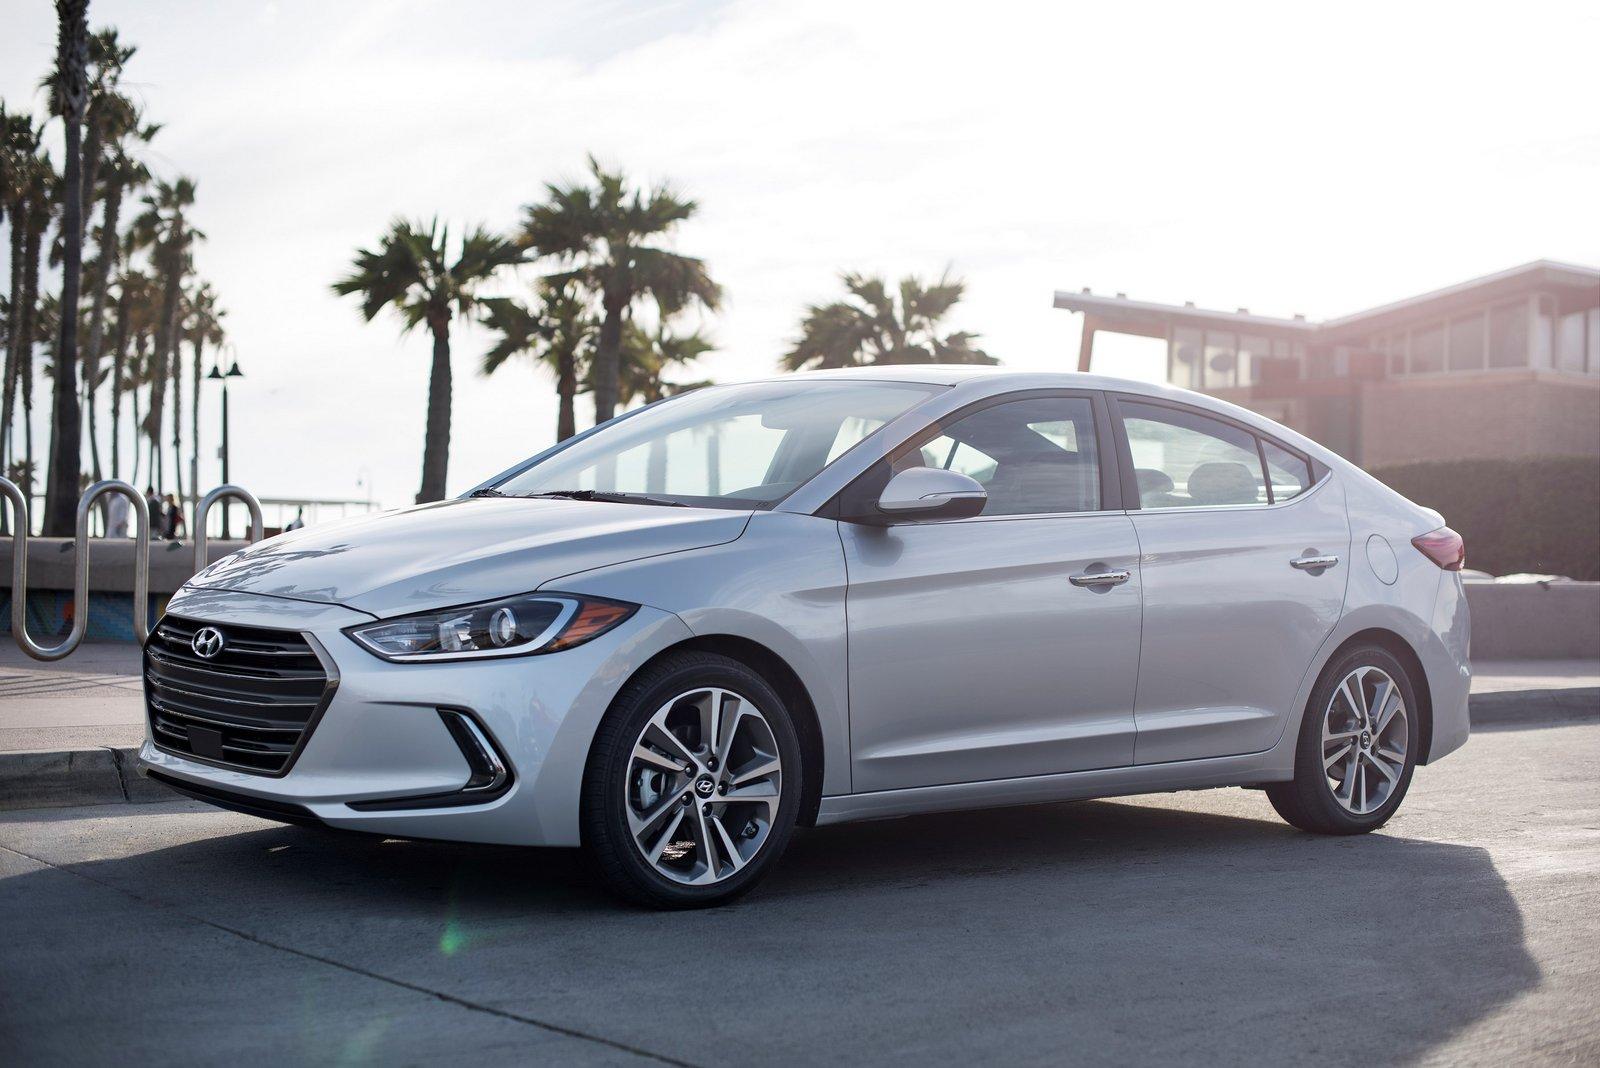 Hyundai Updates Elantra For My 2018 Adds Sel Trim Level Autoevolution